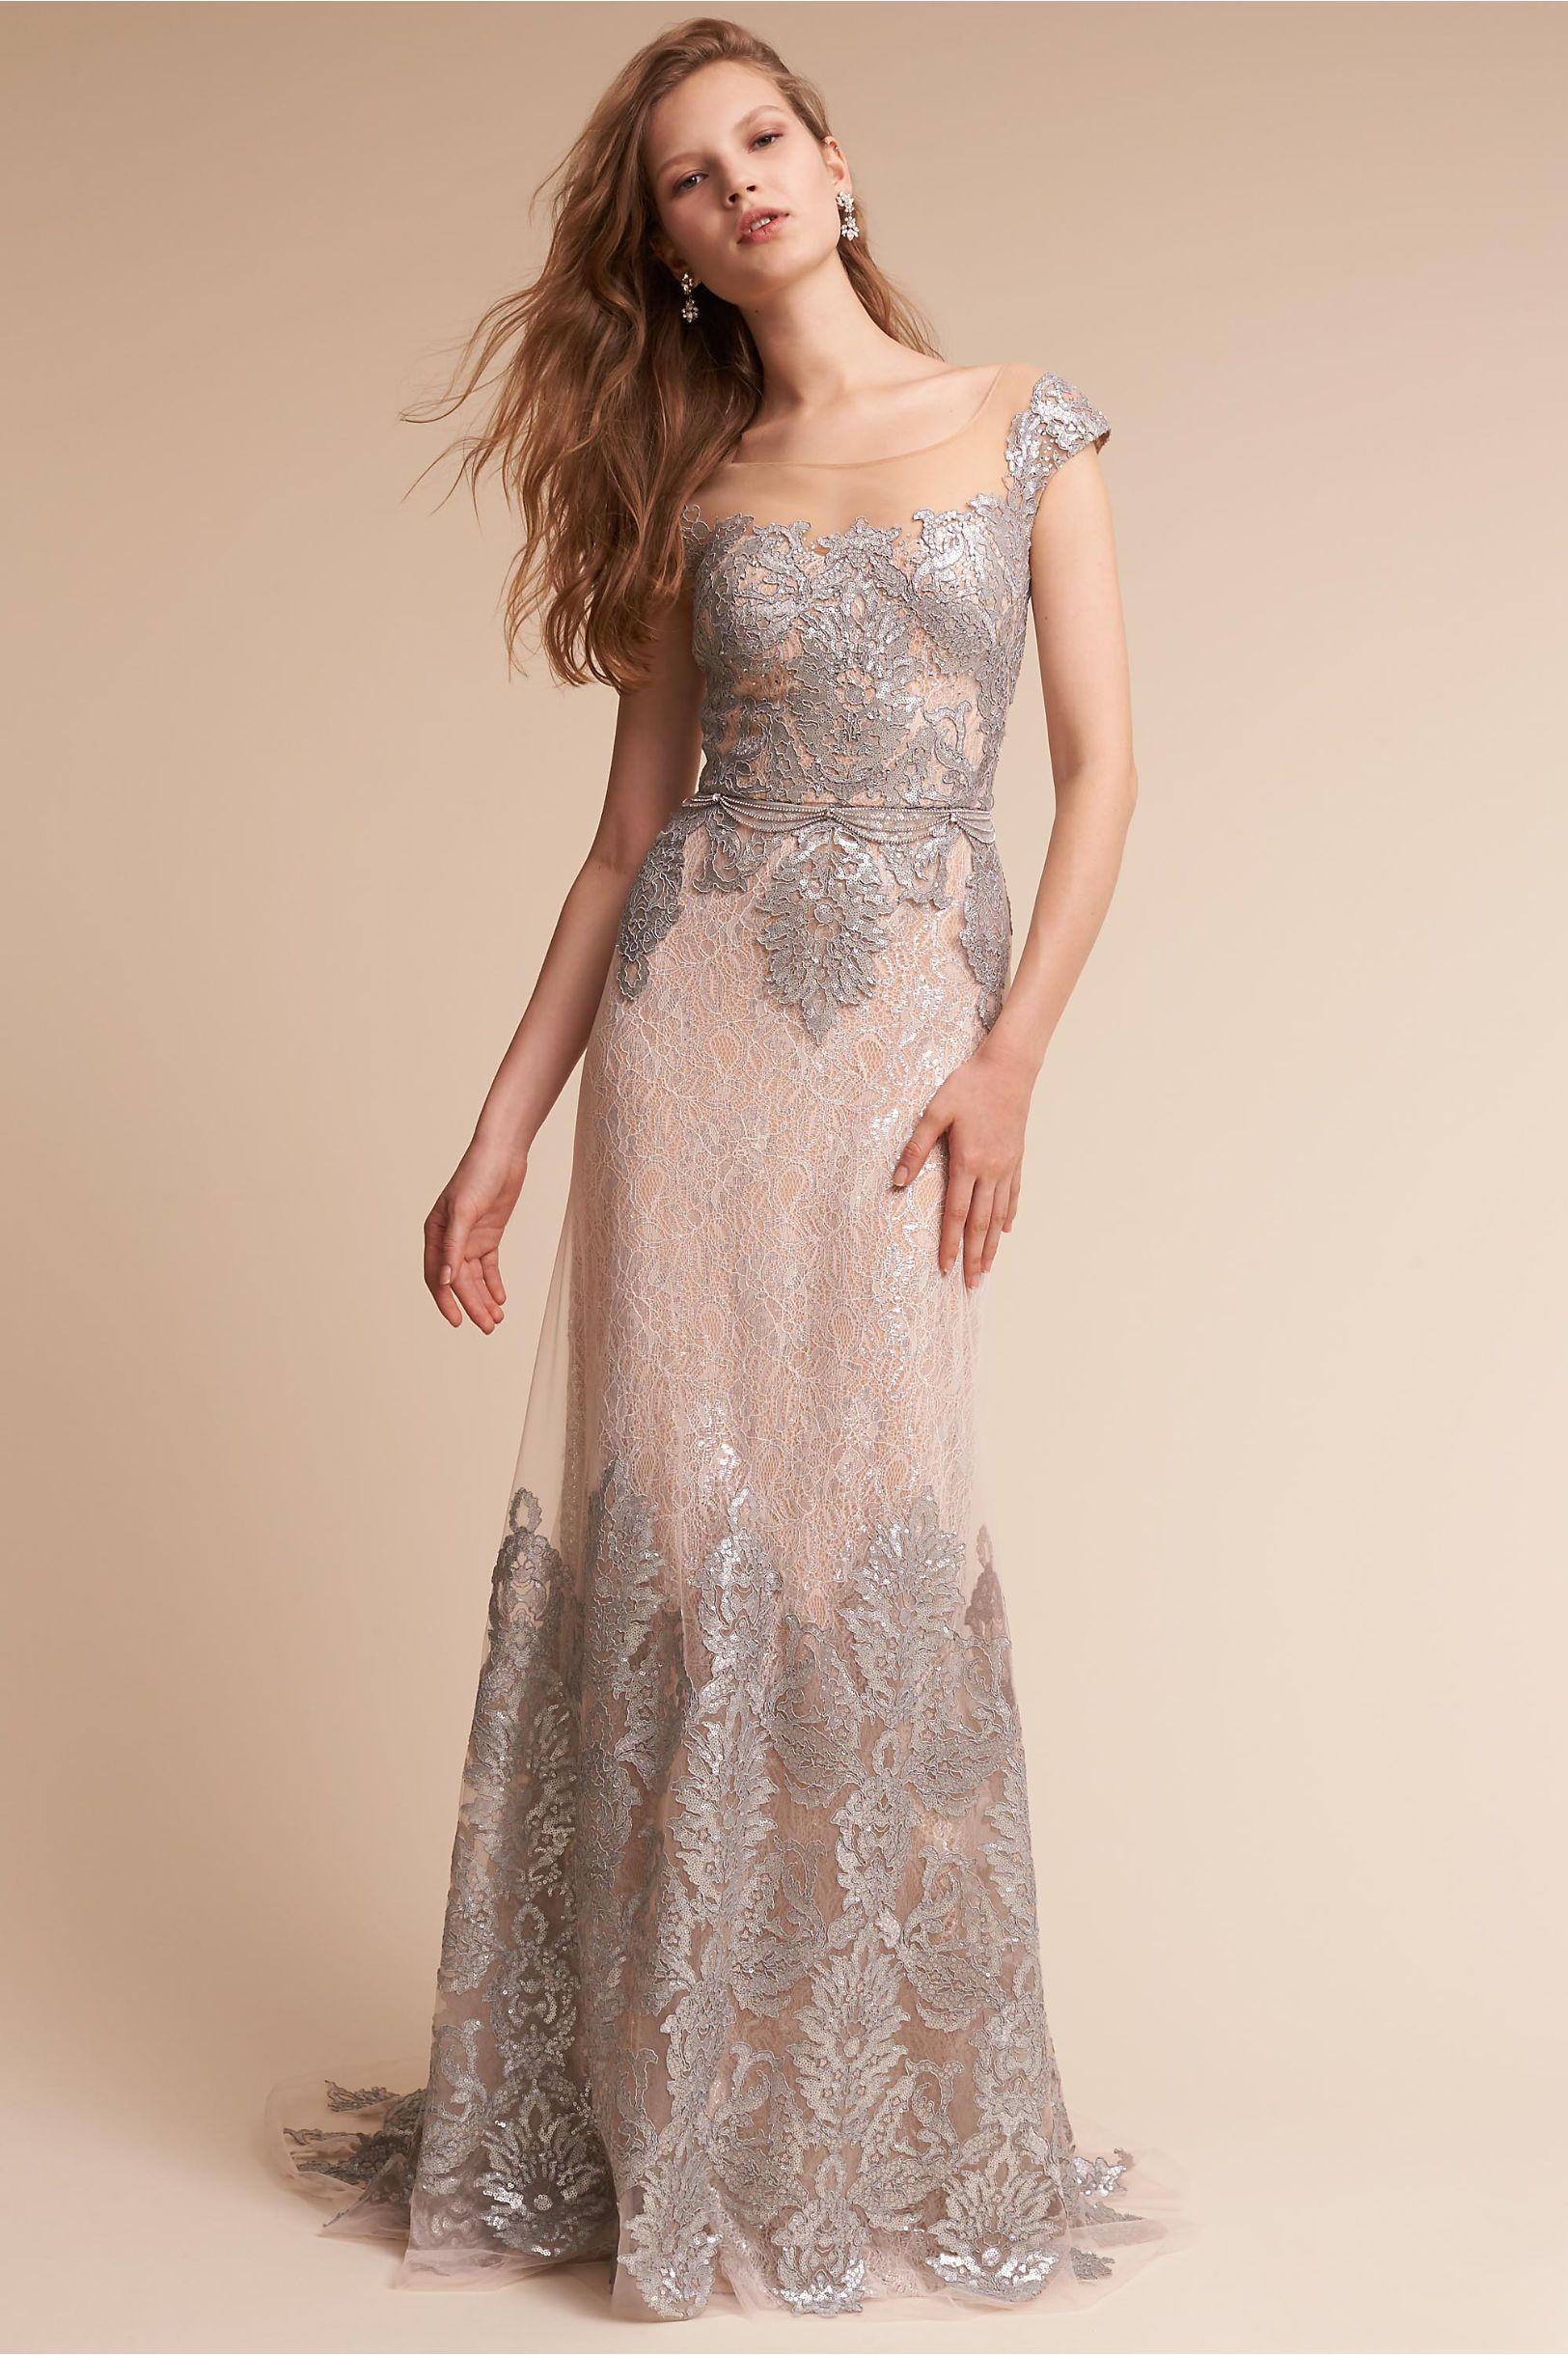 Bhldns keller dress in gunmetalnude bhldn mob dresses and bhldns keller dress in gunmetalnude ombrellifo Choice Image